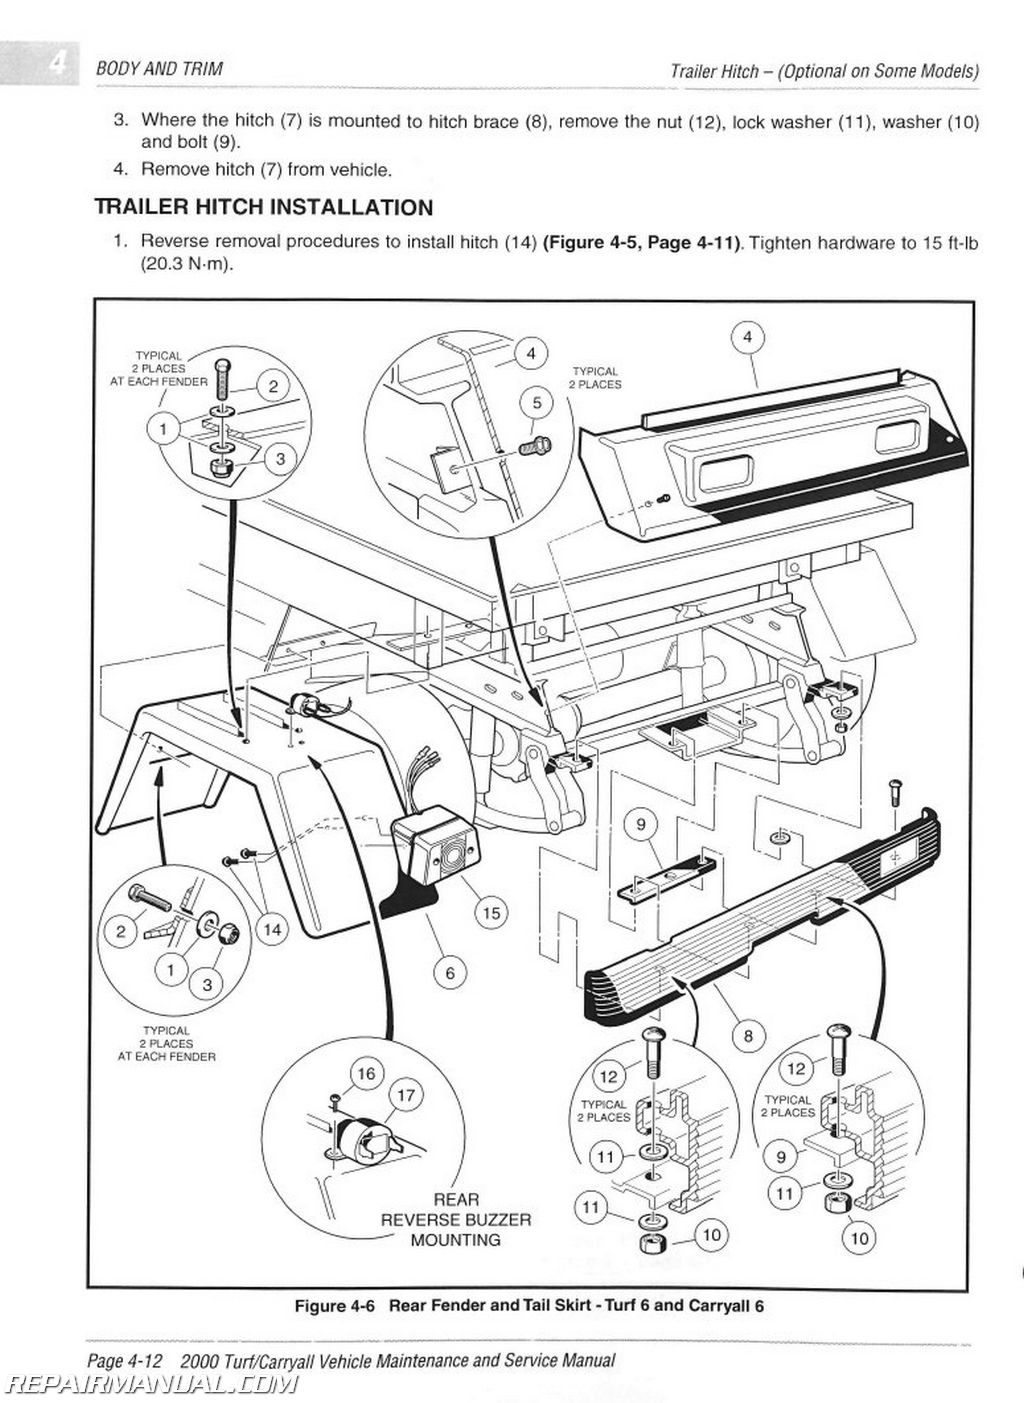 carryall turf 2 wiring diagram